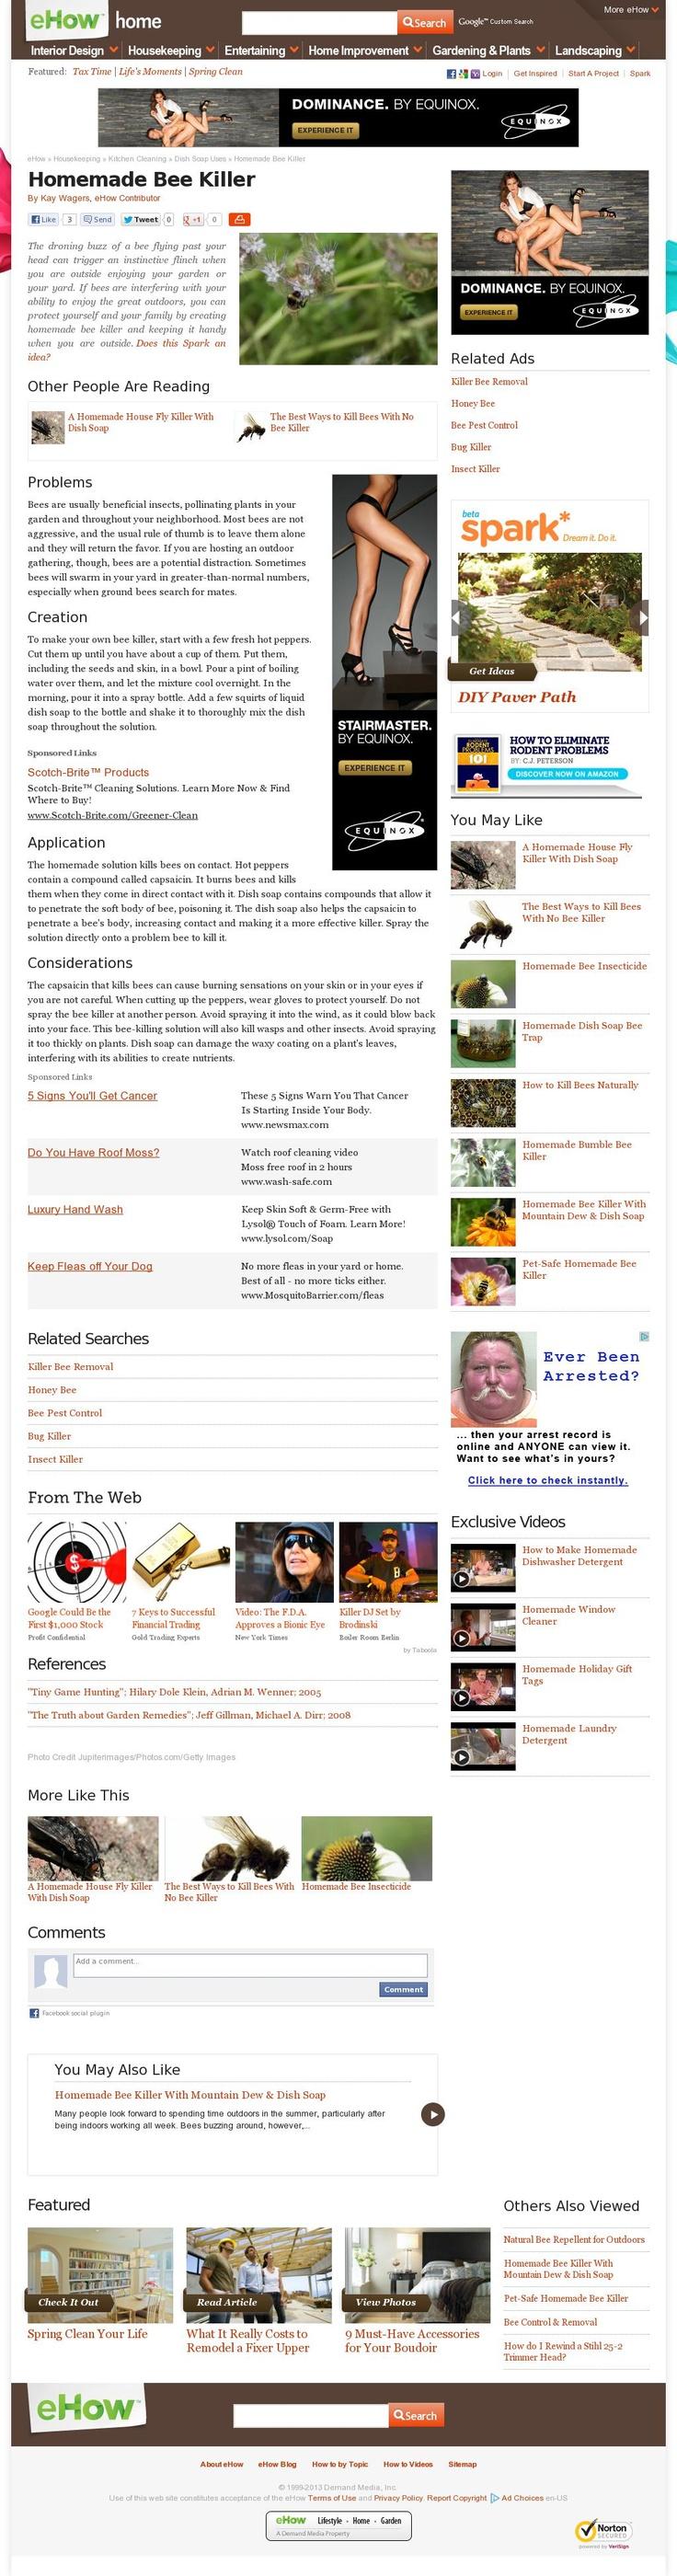 The website 'http://www.ehow.com/info_8161024_homemade-bee-killer.html' courtesy of @Pinstamatic (http://pinstamatic.com)